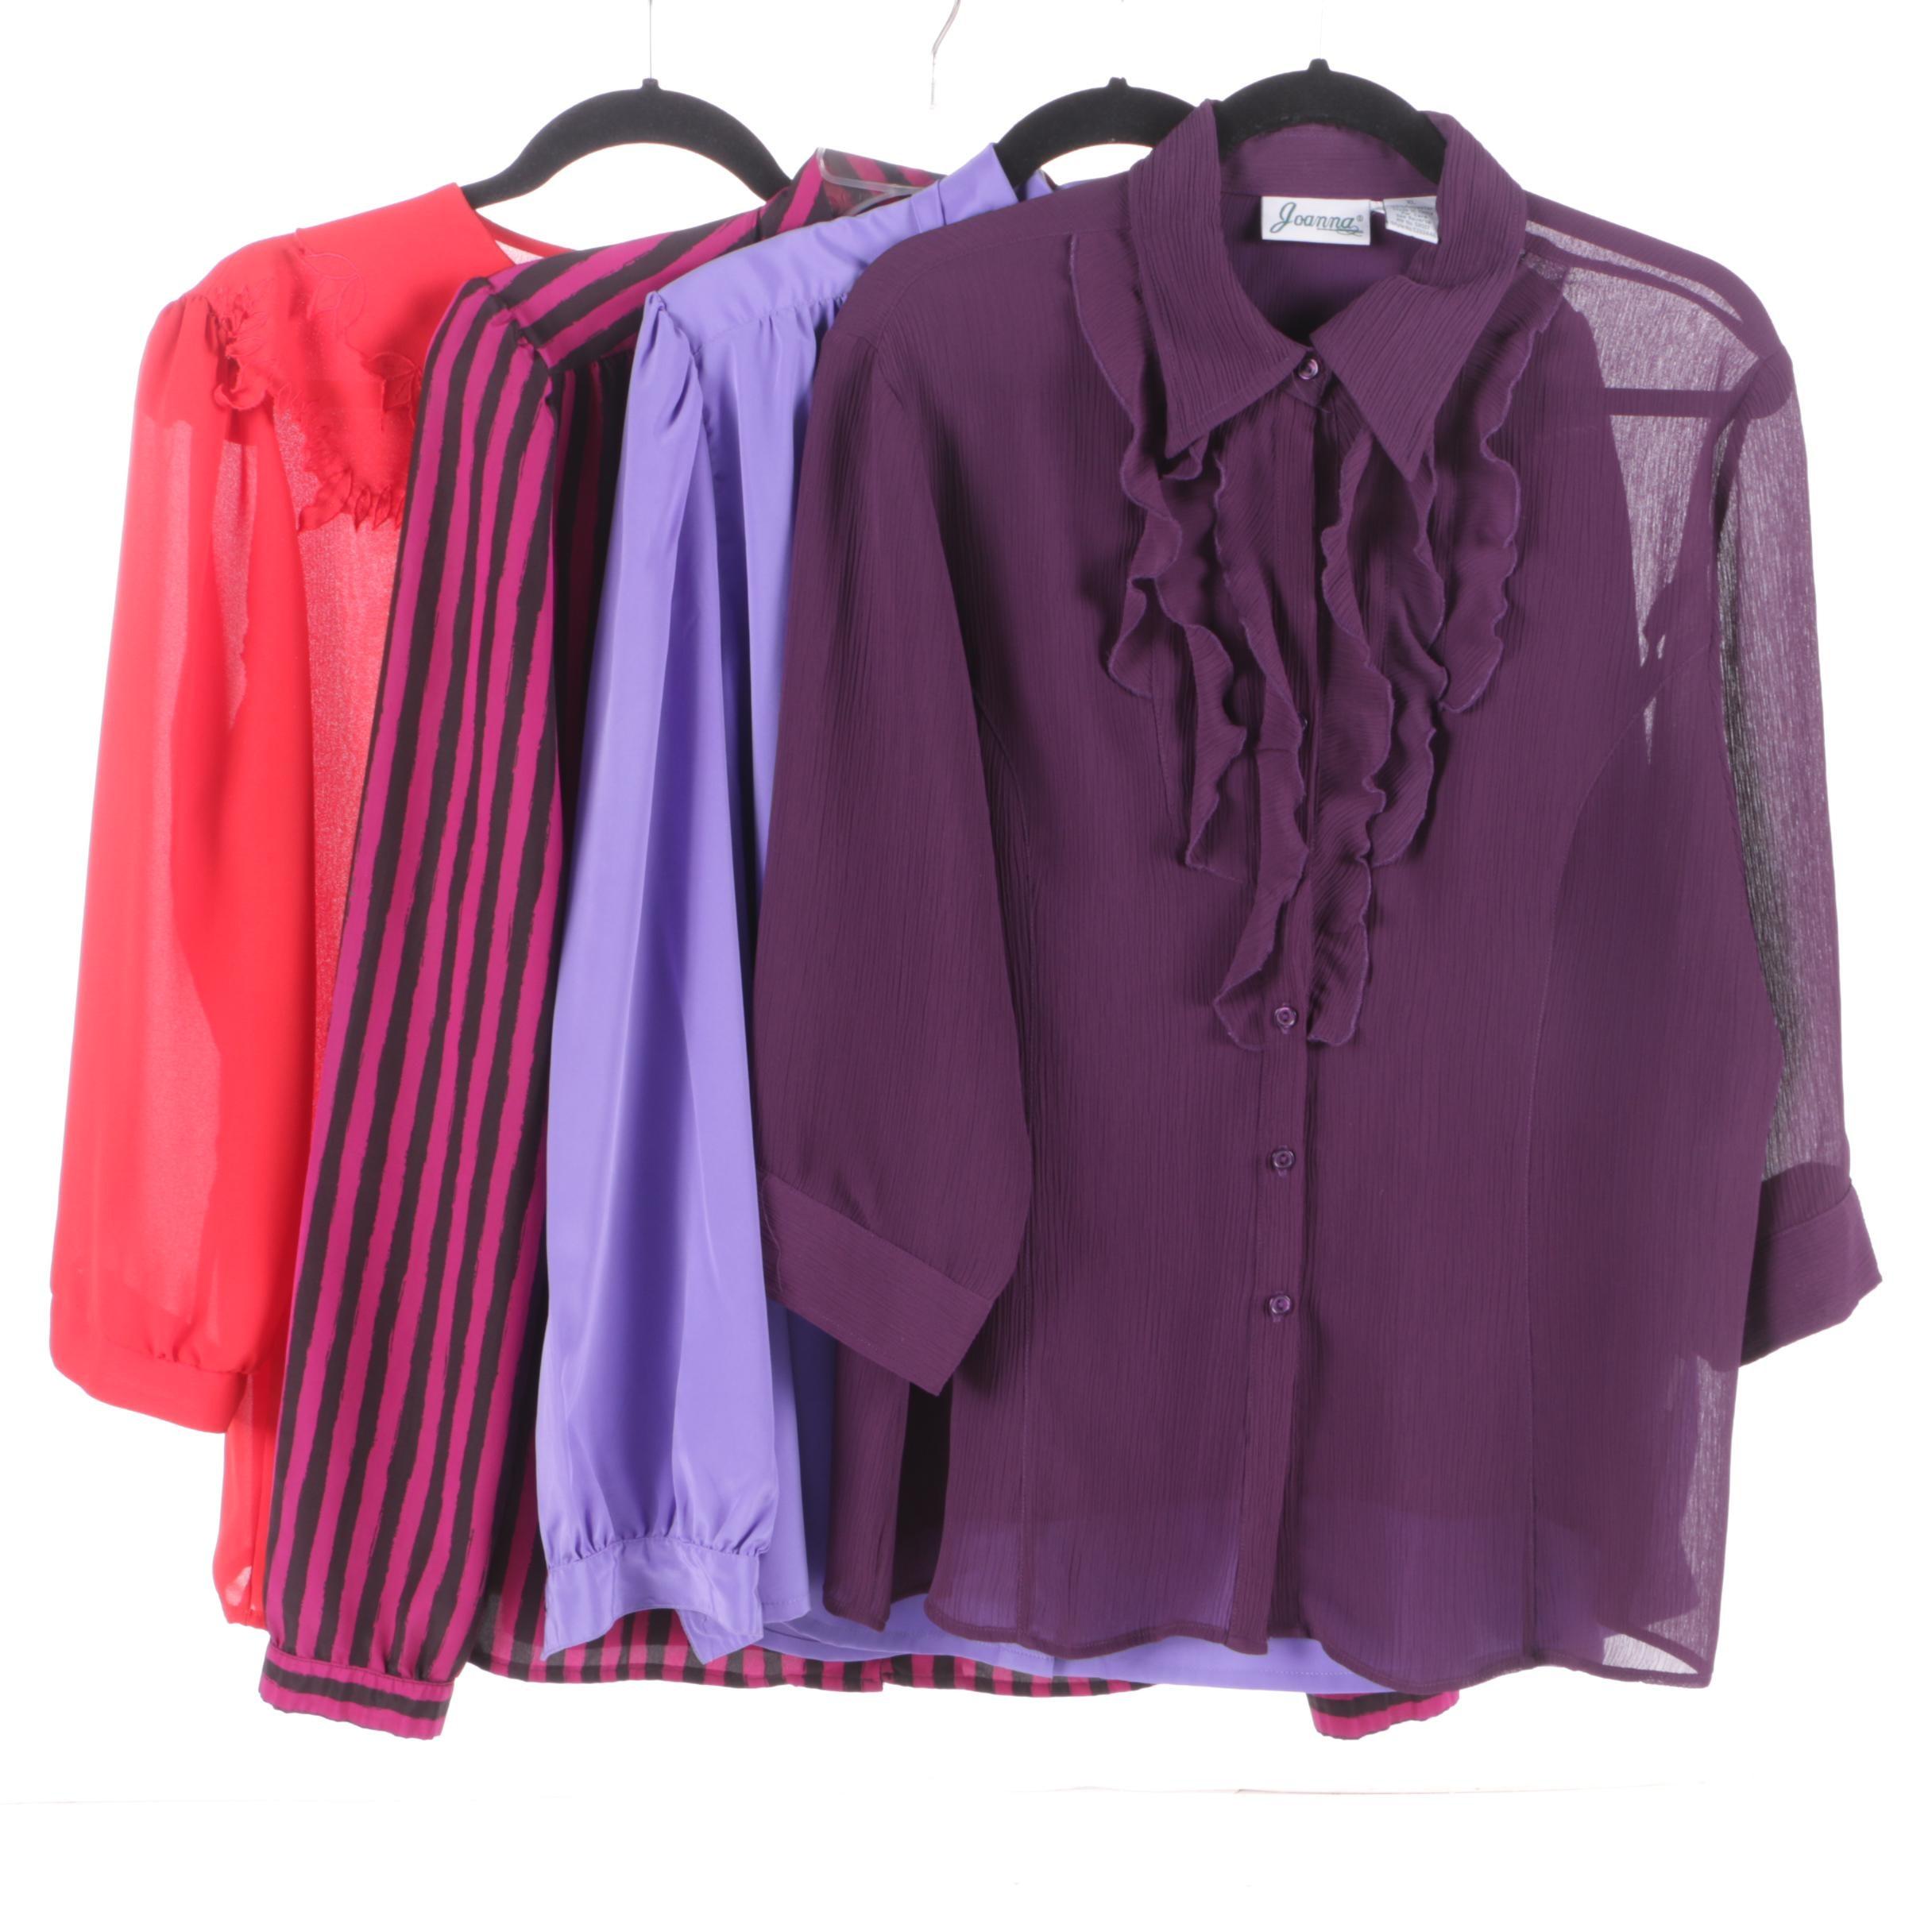 Women's Blouses Including Joanna, Josephine Woman, Sheldon, Winks Lane